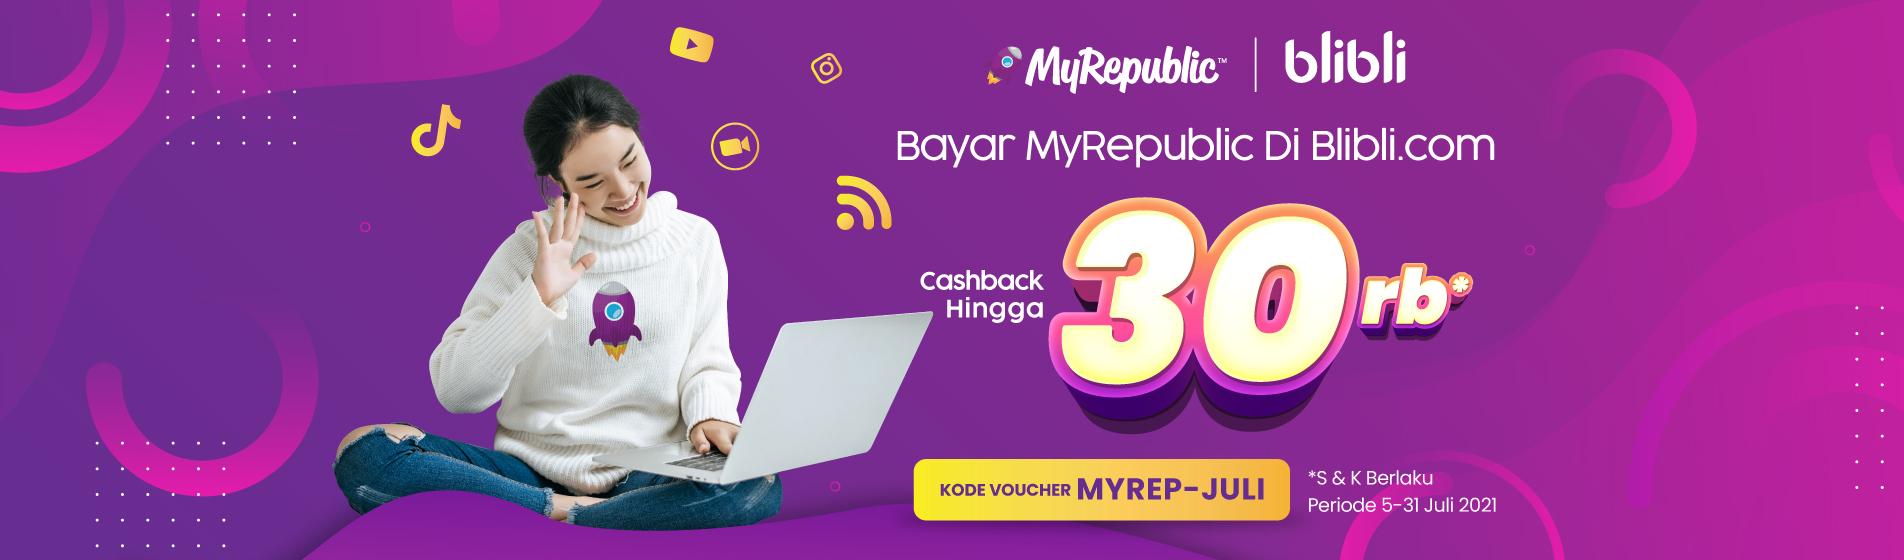 Payment Promo Via Blibli